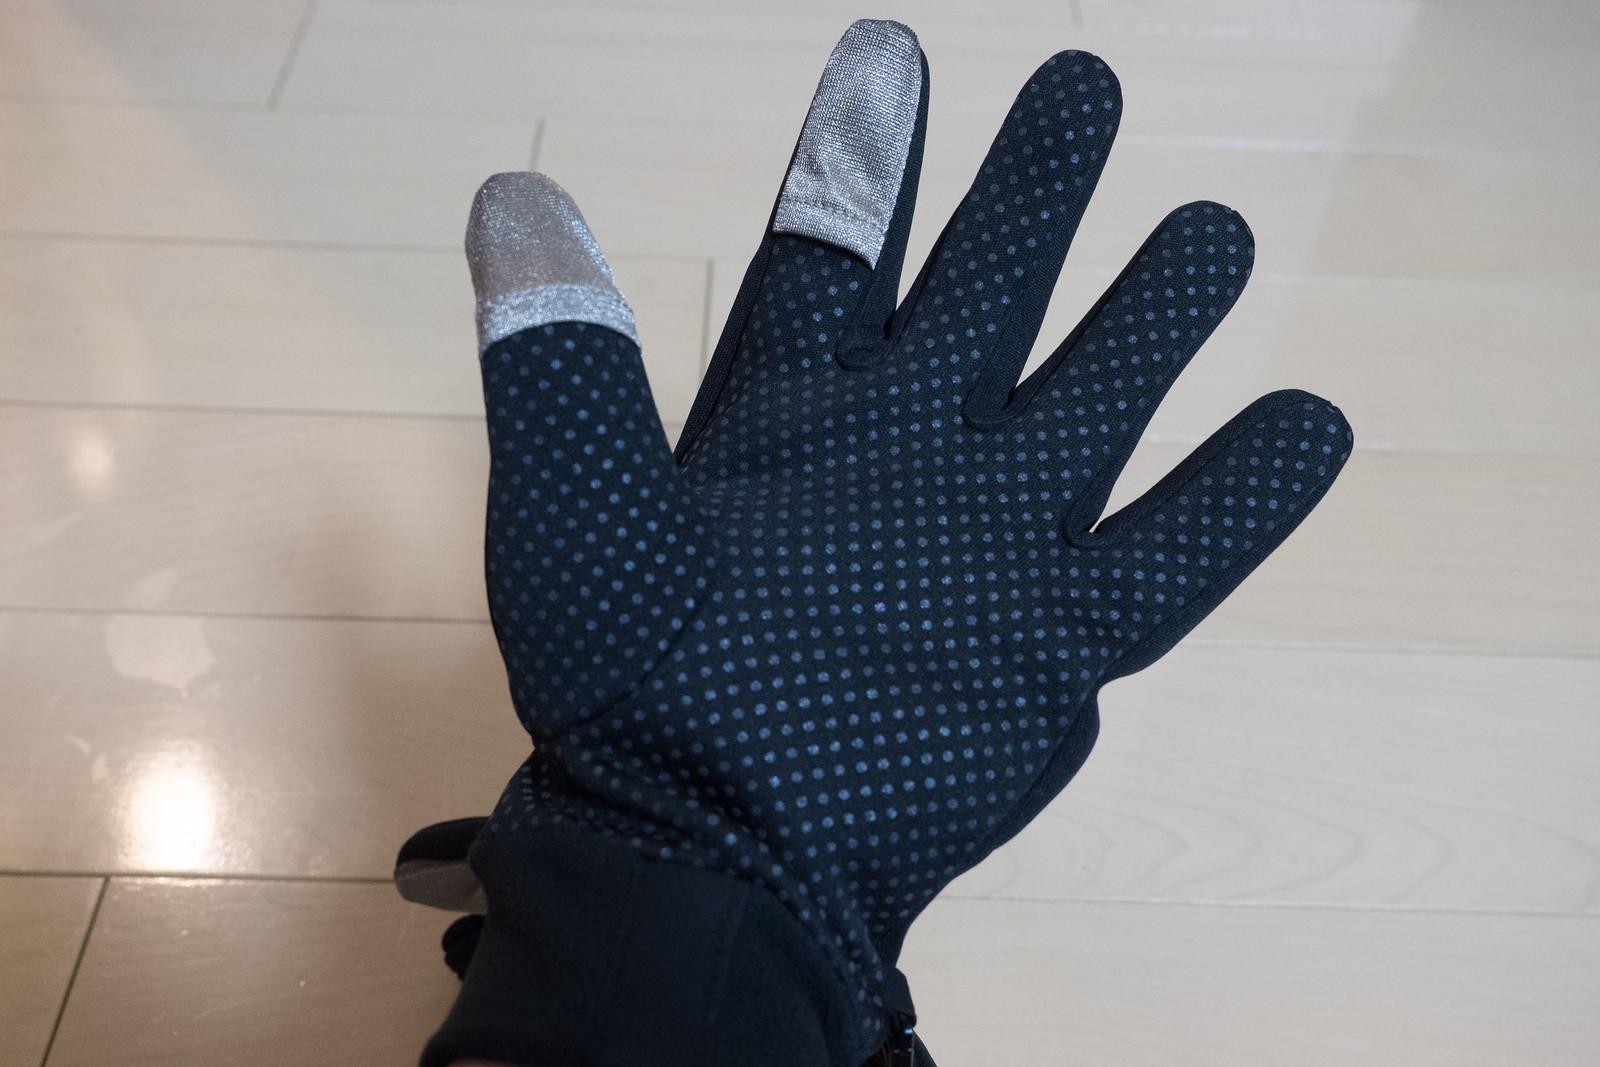 LowePro_Photo_Glove-3